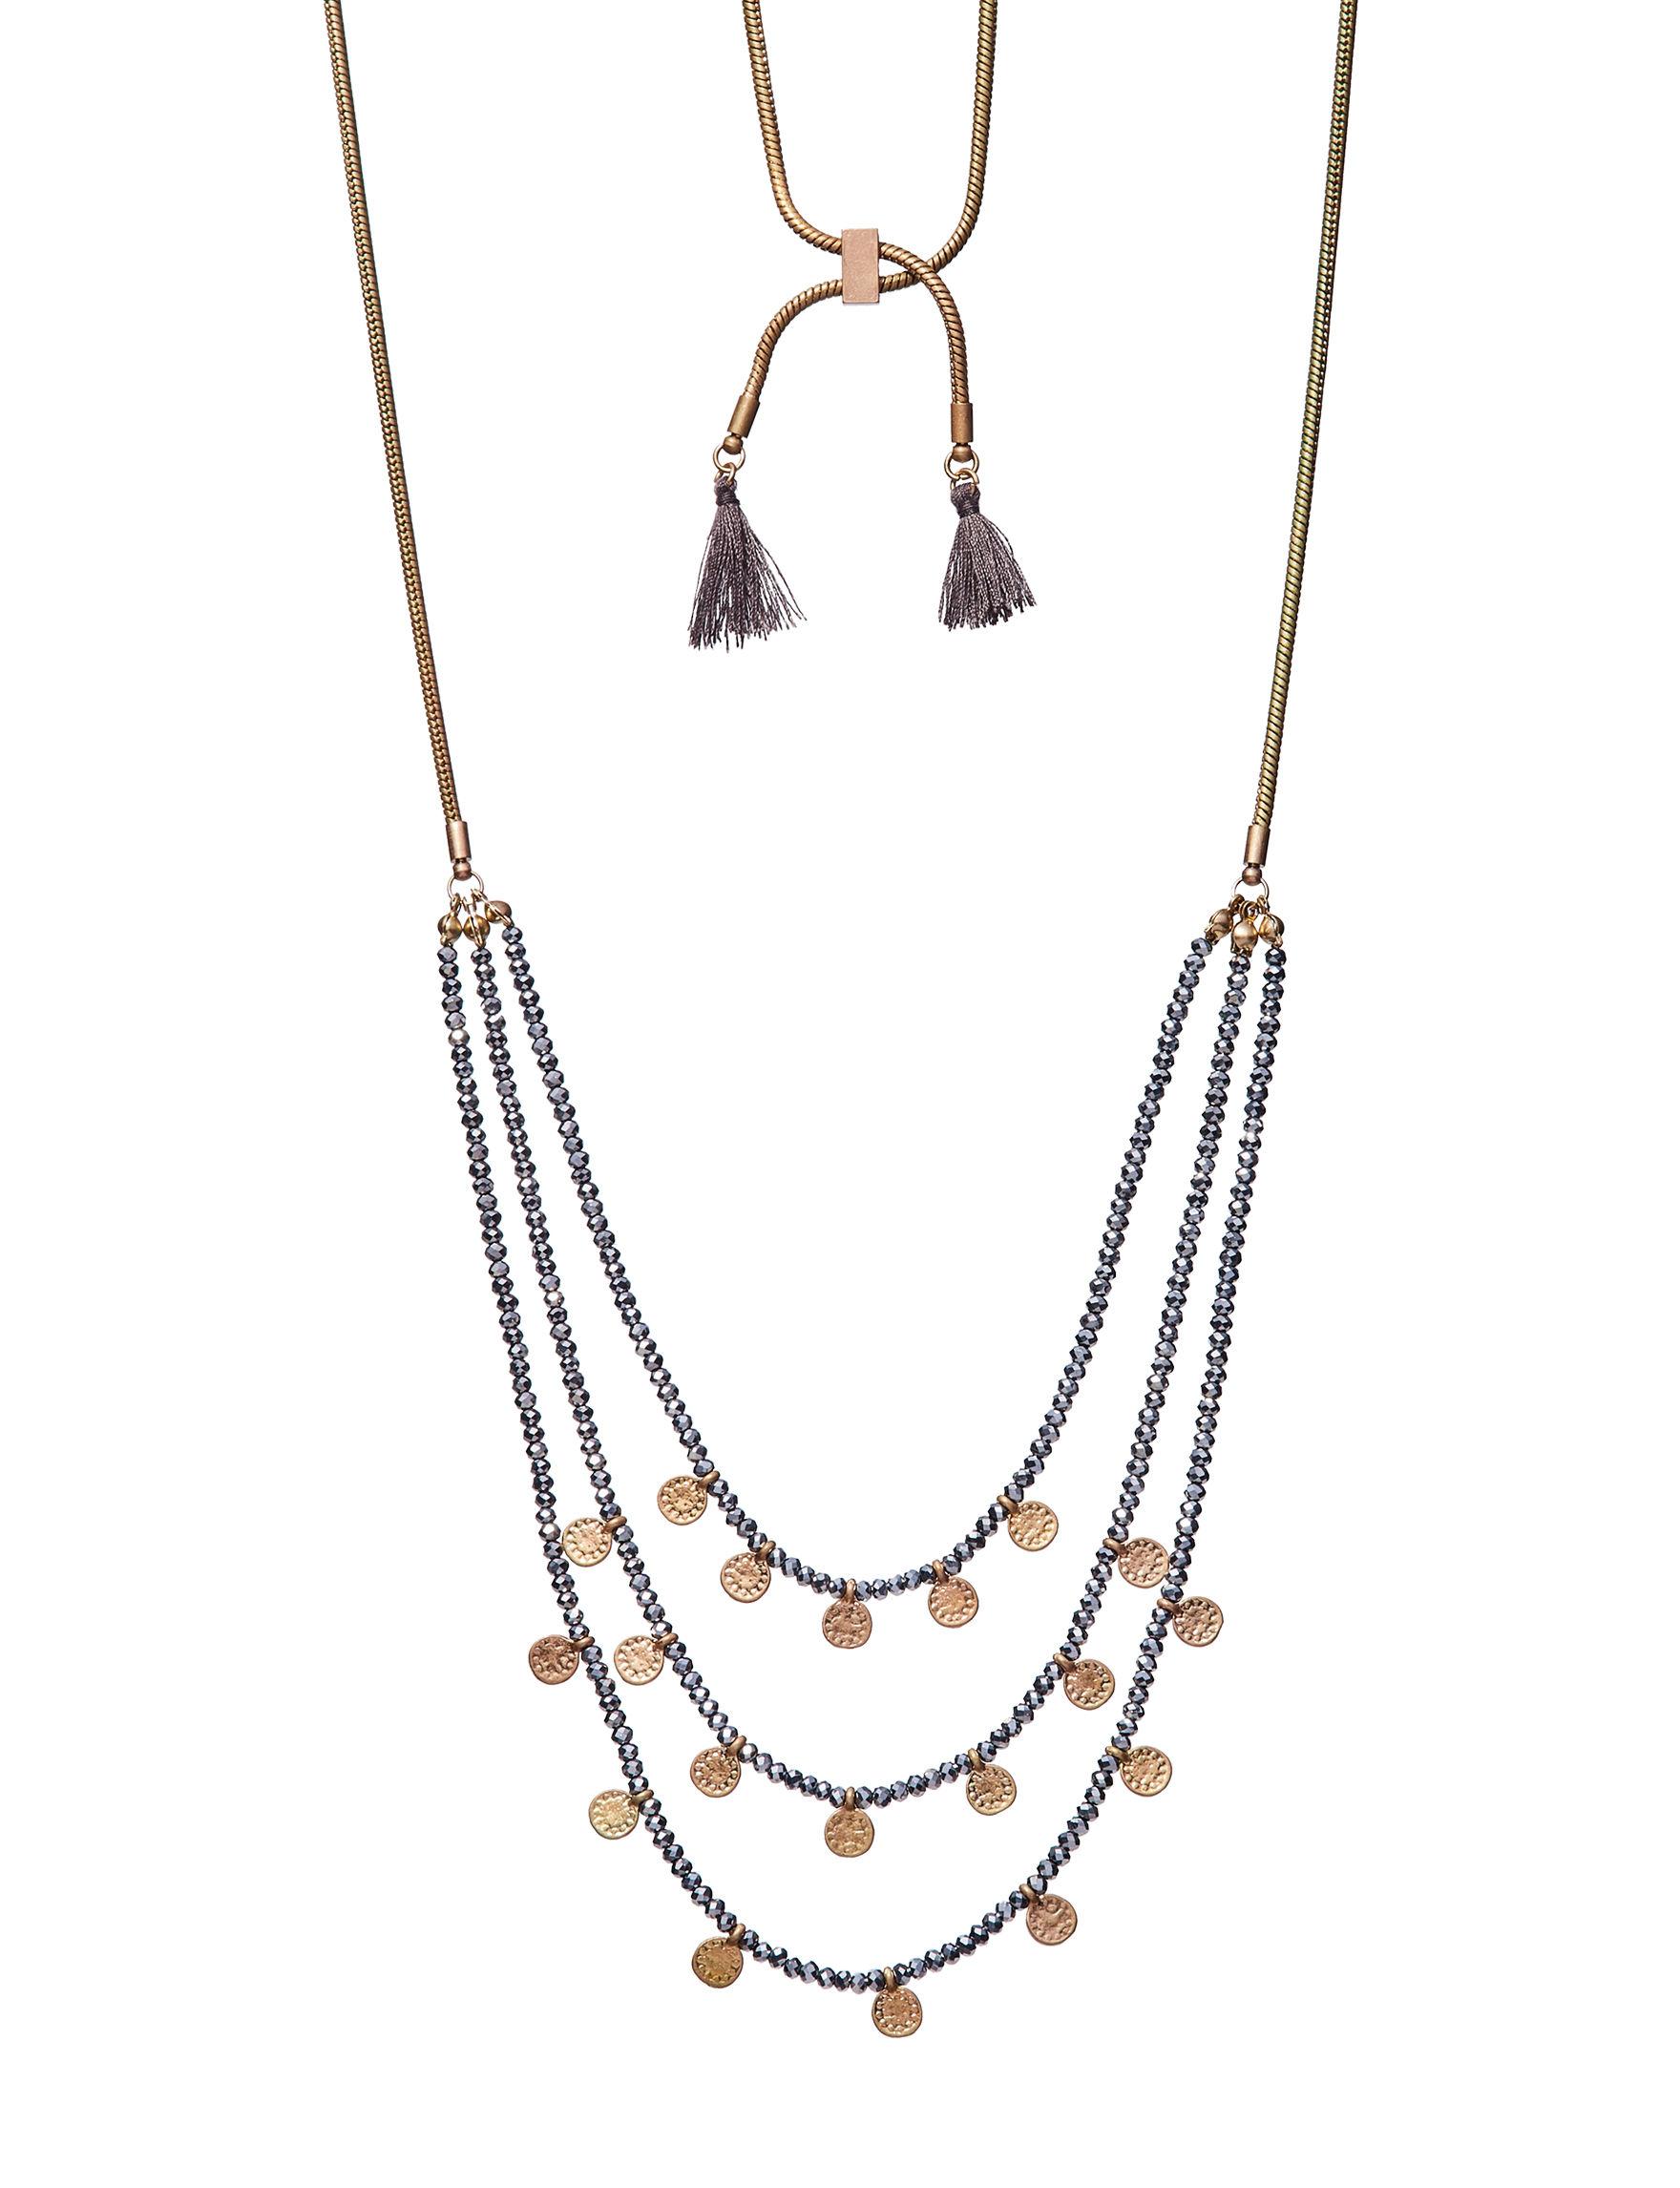 Hannah Grey Necklaces & Pendants Fashion Jewelry